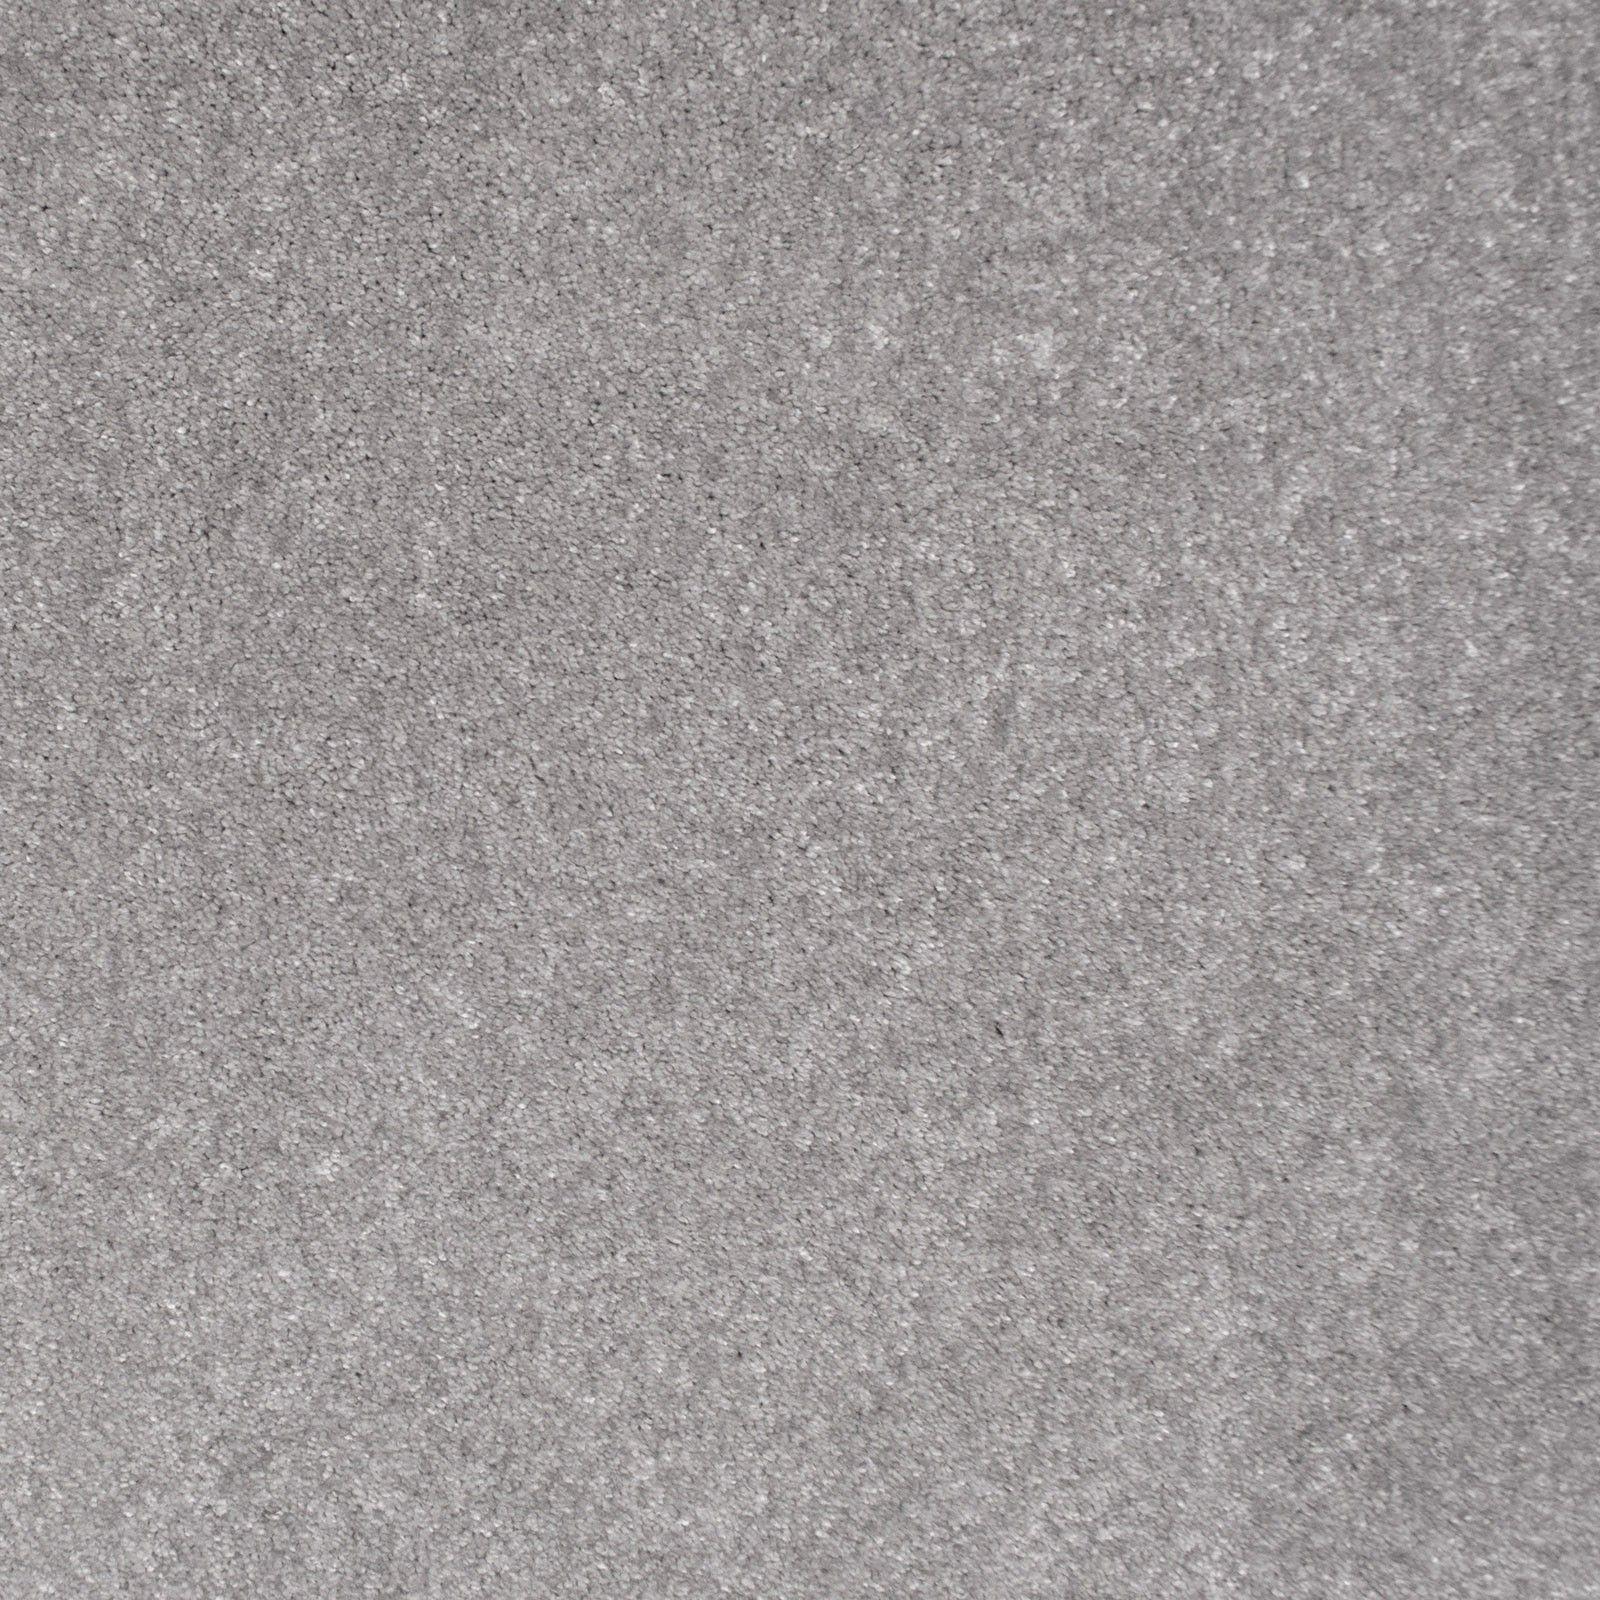 Warm Grey Splendour Isense Carpet Buy Splendour Isense